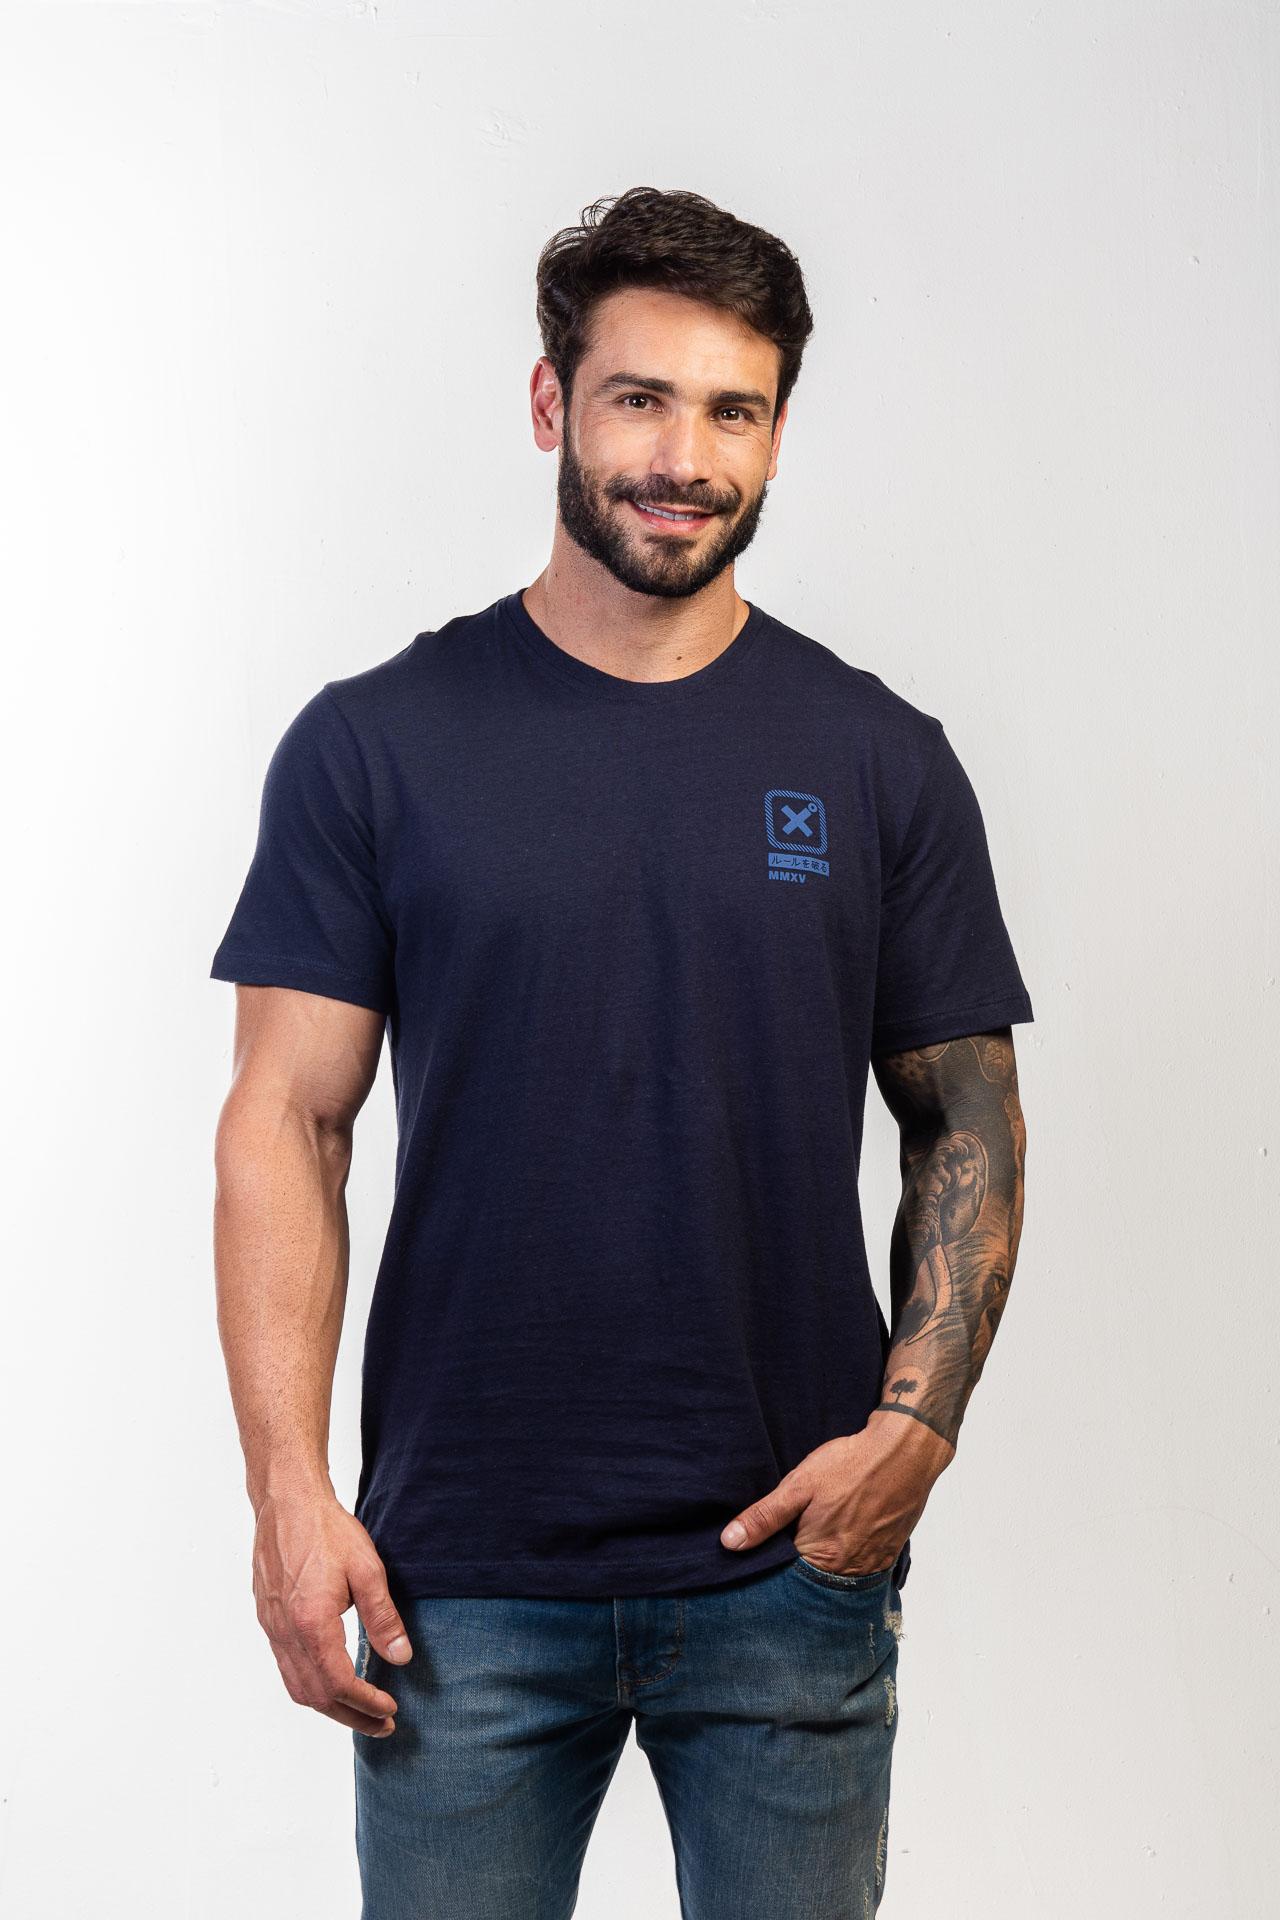 Camiseta Masculina TXC 19441